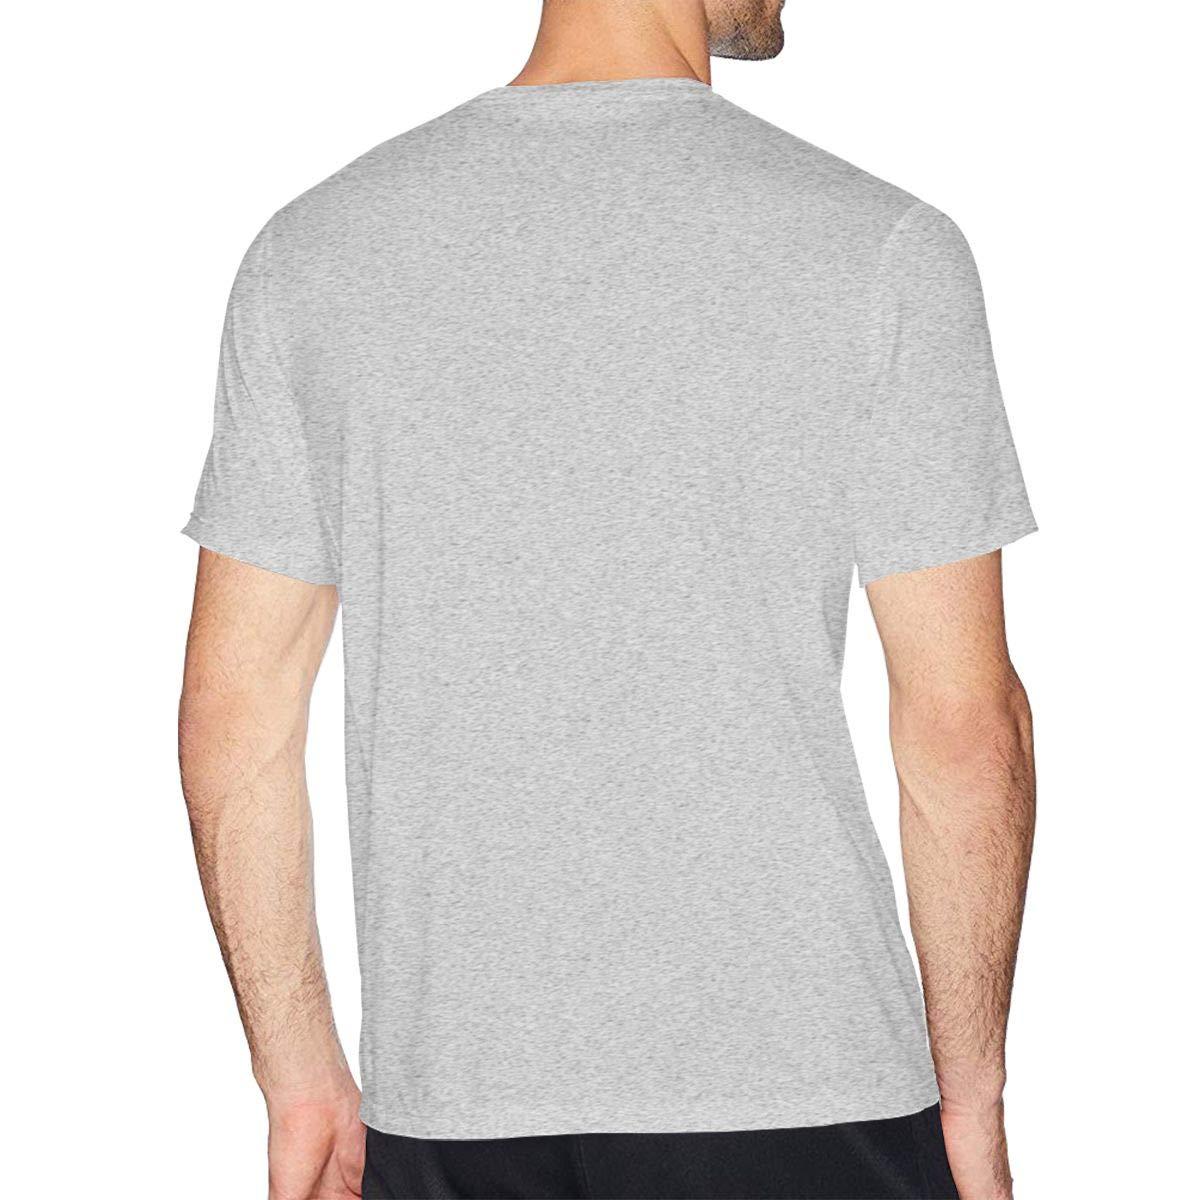 MSKKLA Angry Llama Jersey T-Shirt Men Soft Round Collar T-Shirts Tee Shirts Plus Size